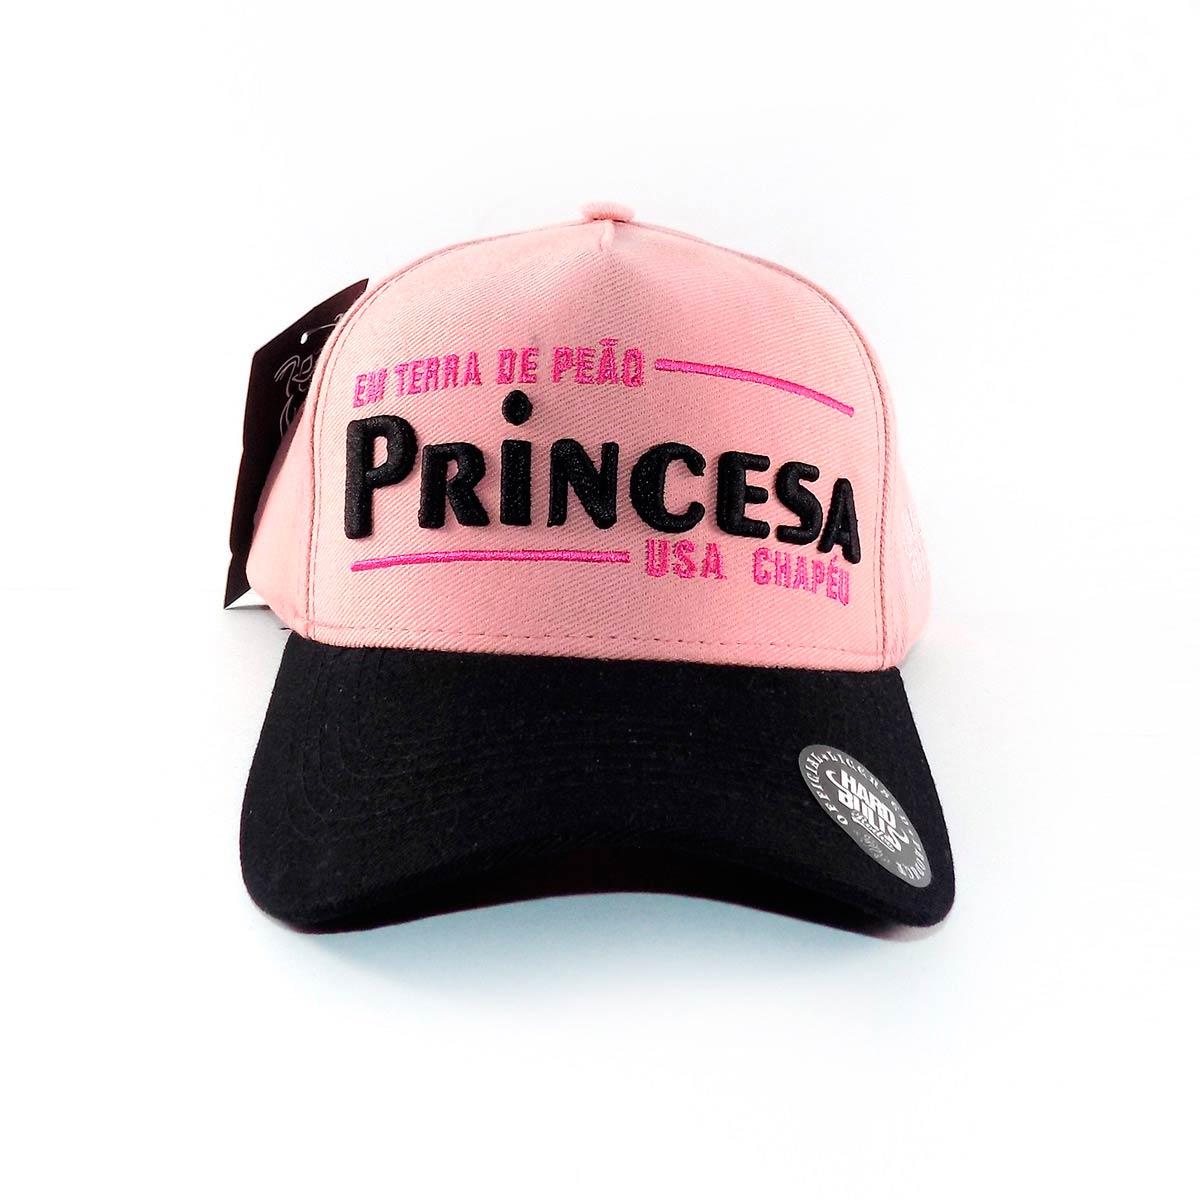 Boné Country Princesa Usa Chapéu - Rosa e Preto